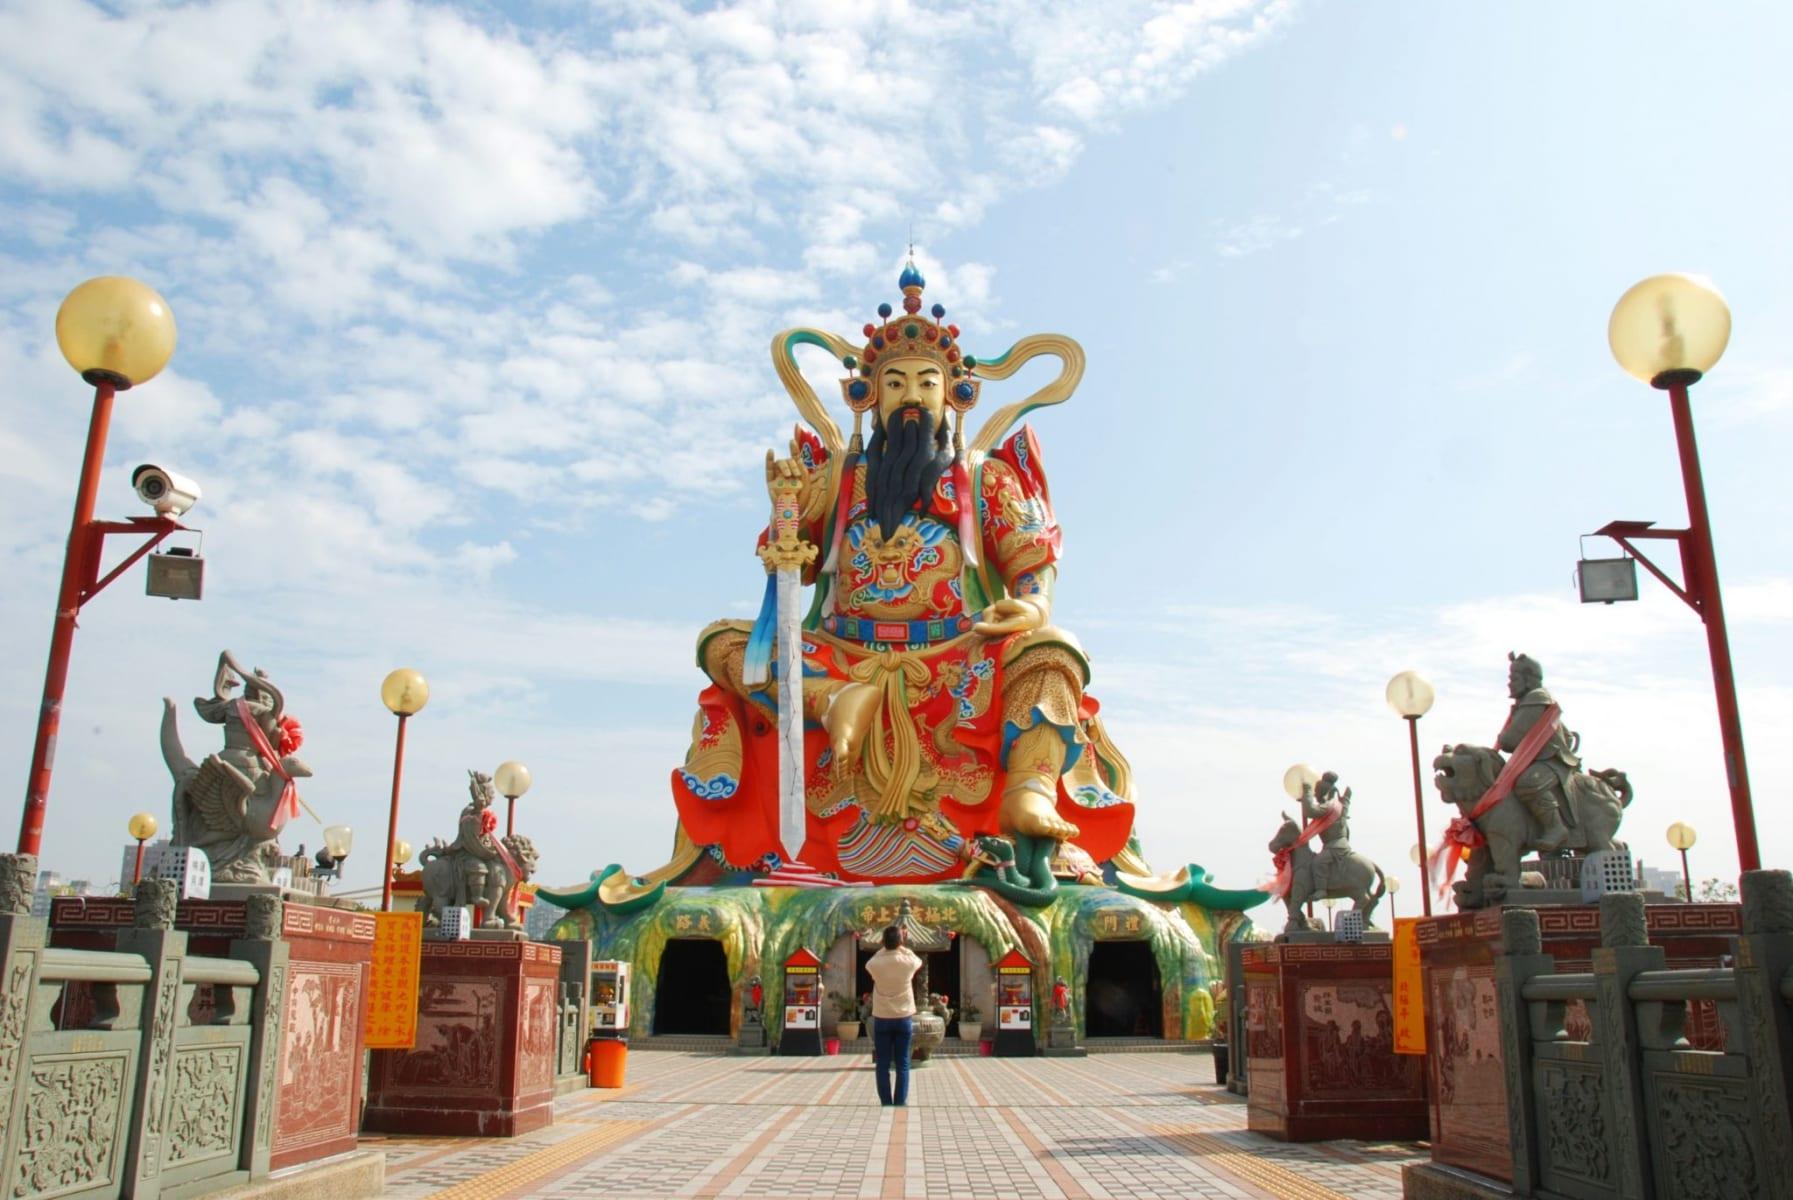 Socha taoistického boha Xuan Tian Shang Di u Lotusového jezera v Kao-siungu, Tchaj-wan